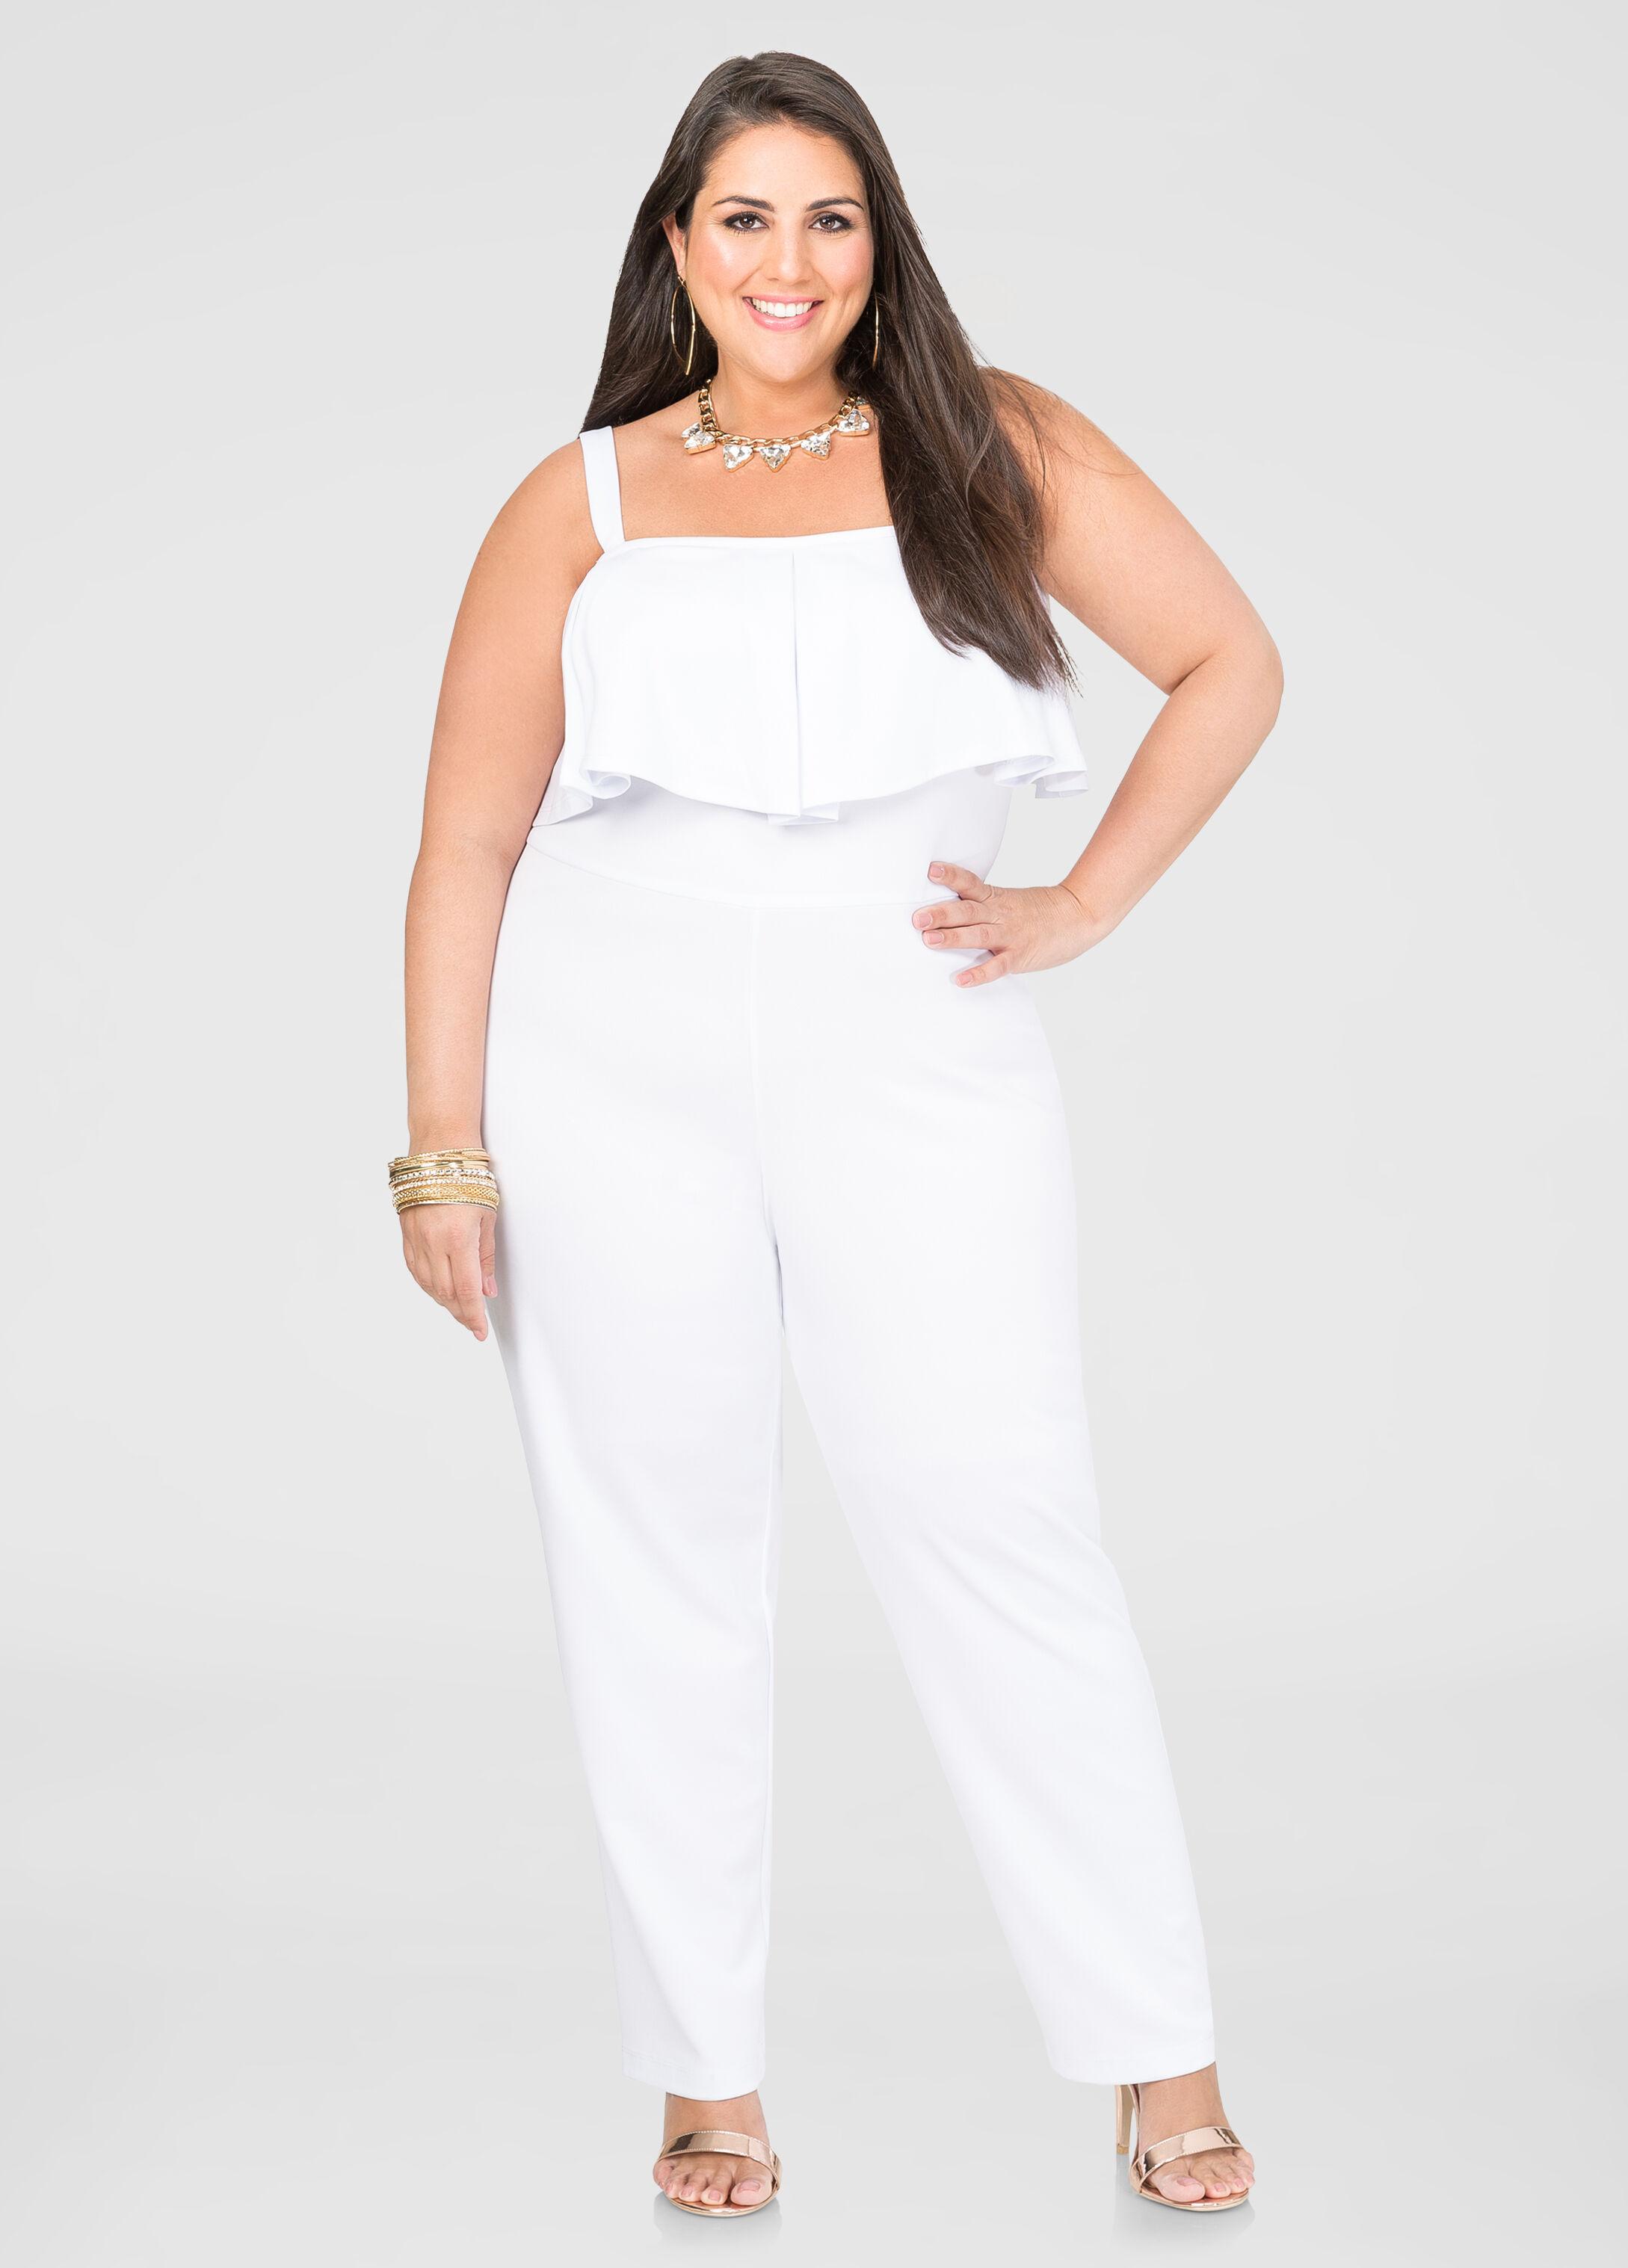 4c4b3ef442d Buy plus size jumpsuits for evening wear ashley stewart jpg 346x482 Plus  size white dressy jumpsuit